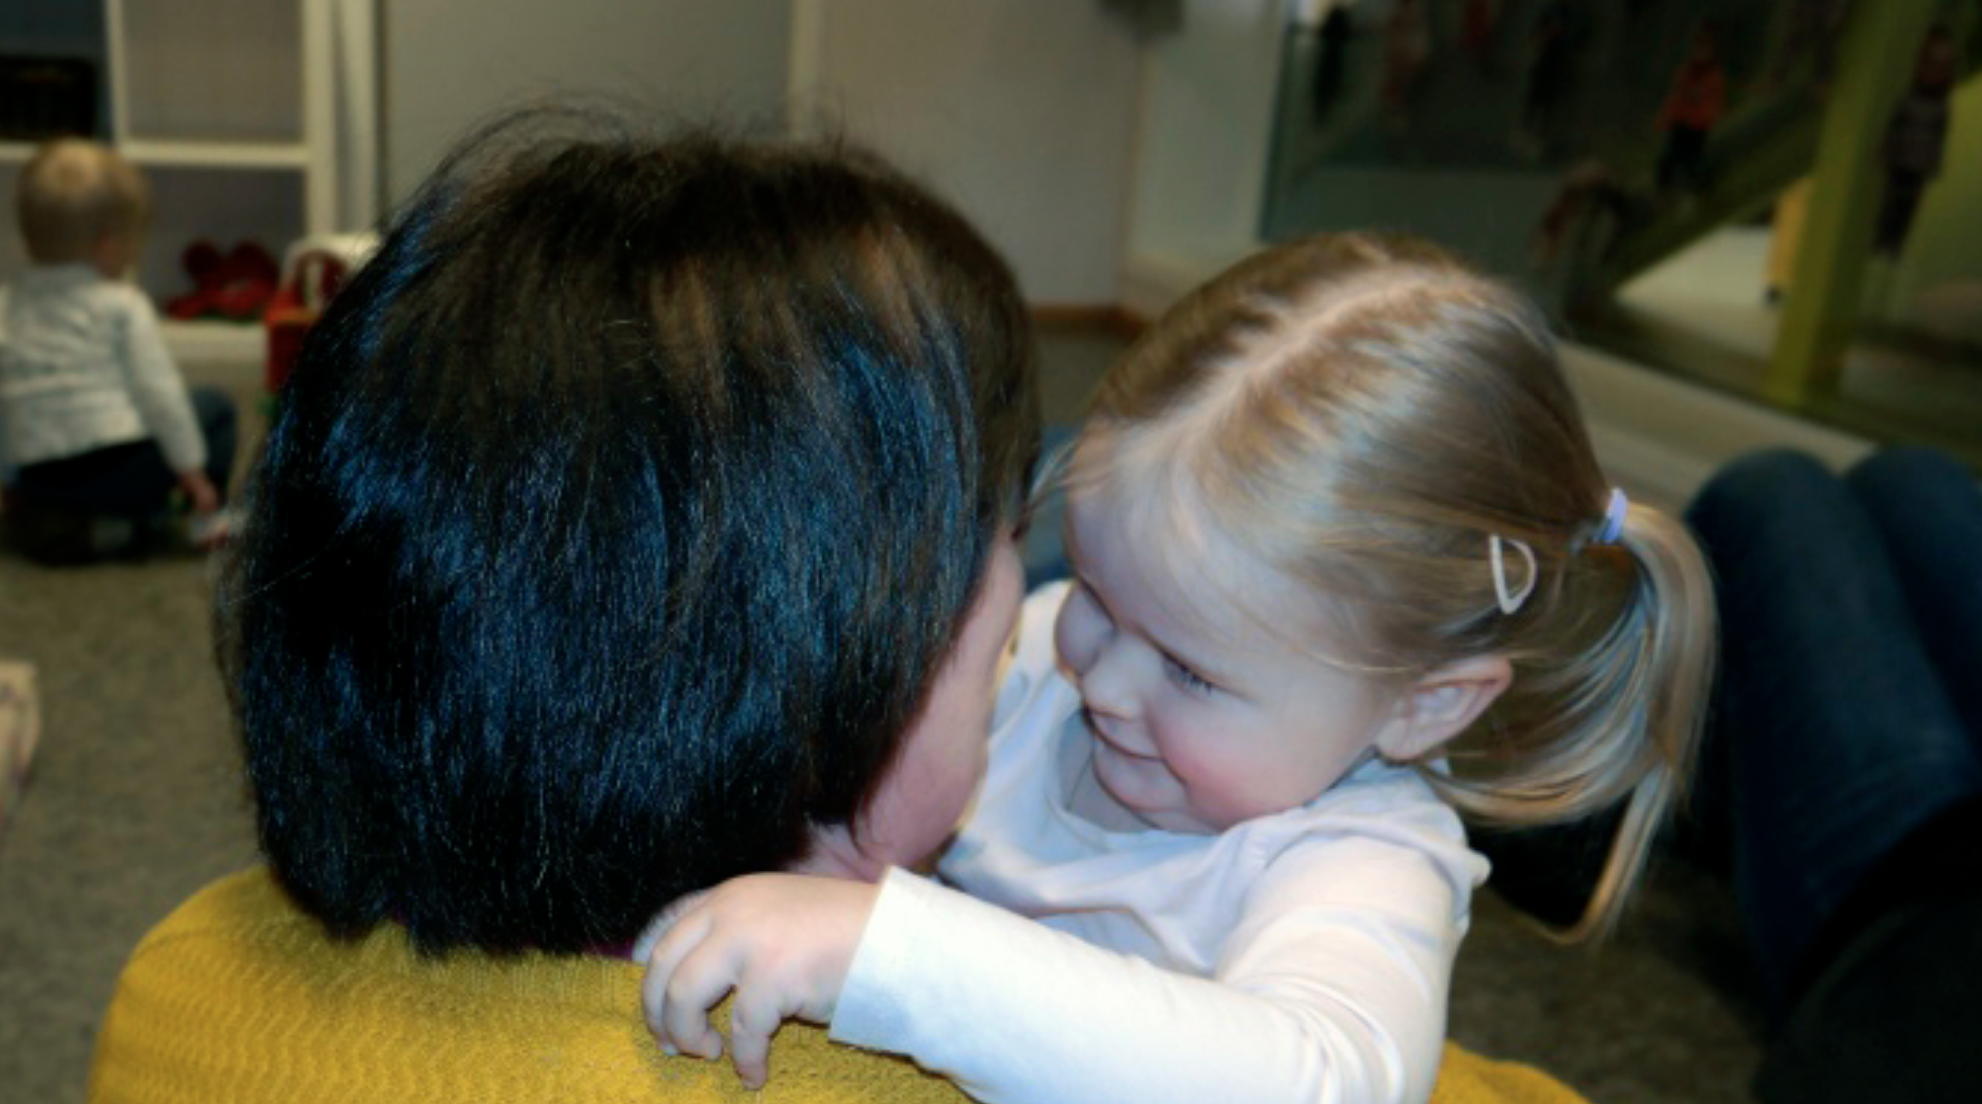 Eit barn får en klem